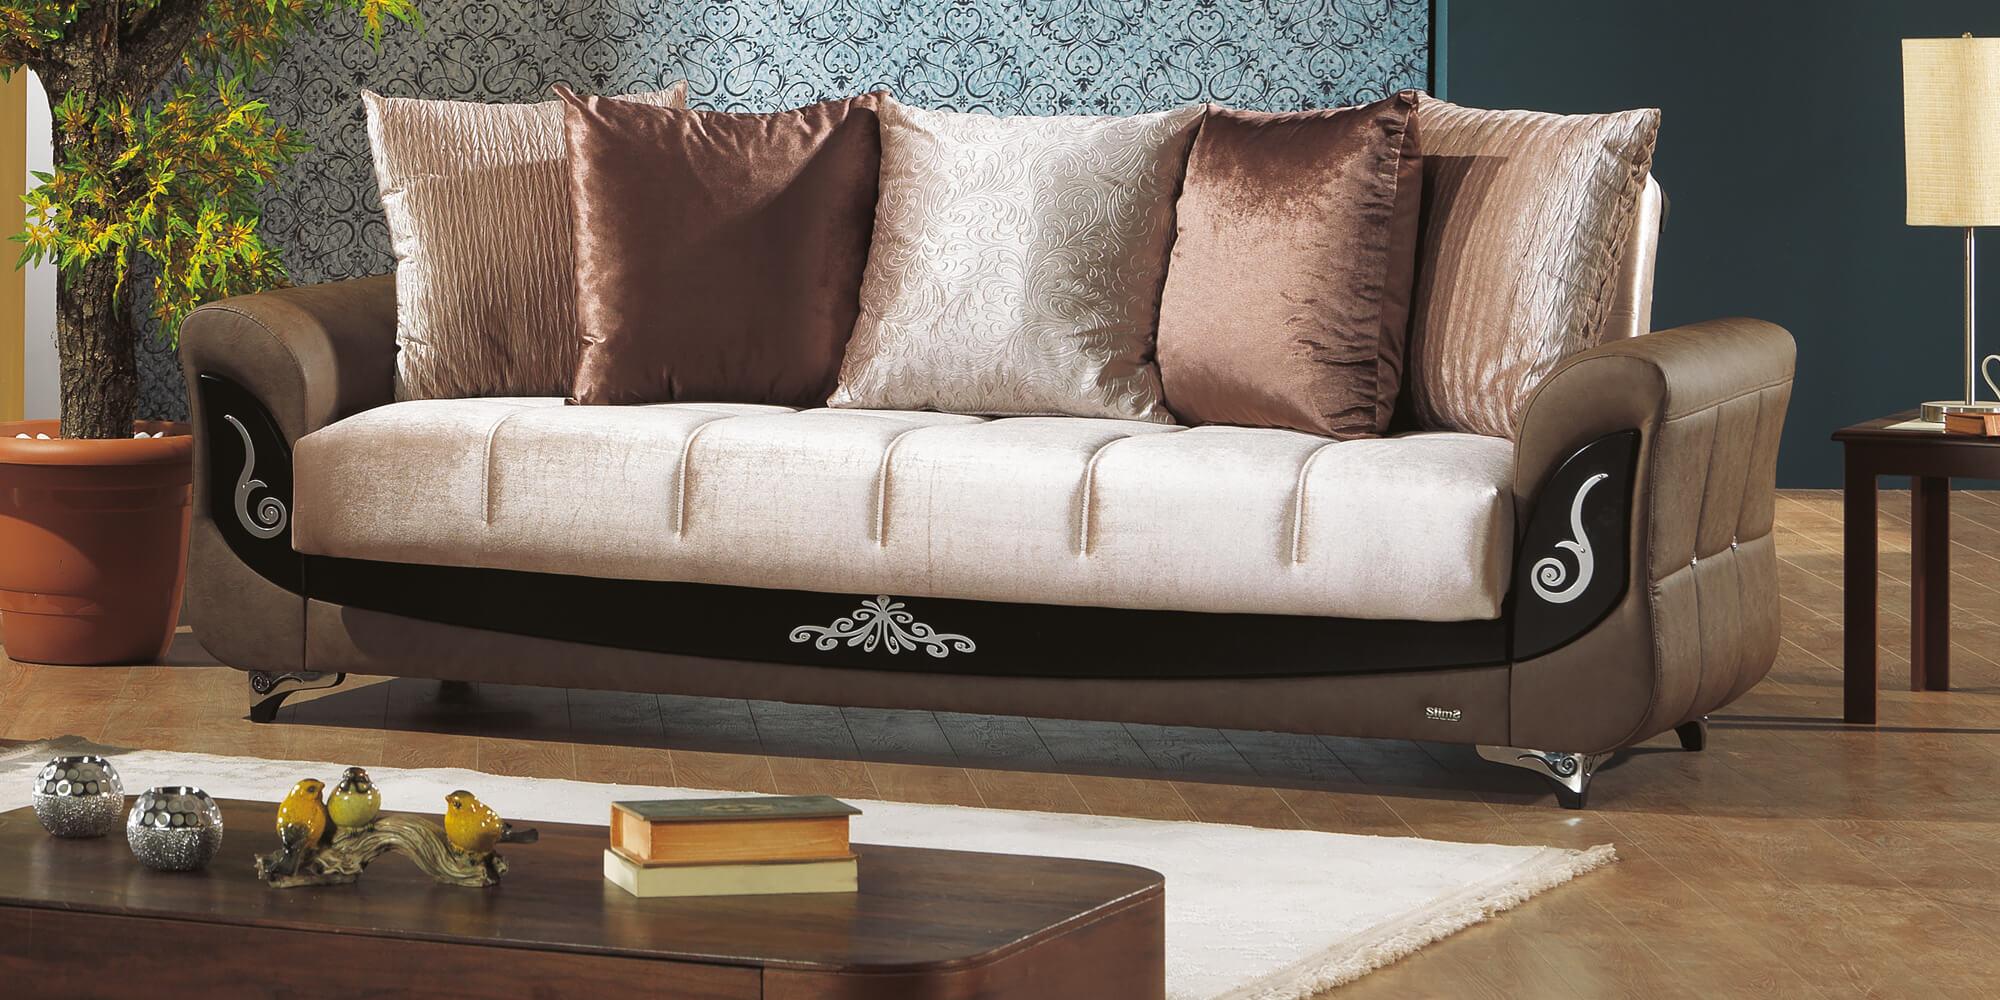 inci 3 2 1 maxi sofa set yuvam m belhaus in wuppertal cilek offizieller h ndler in europa. Black Bedroom Furniture Sets. Home Design Ideas